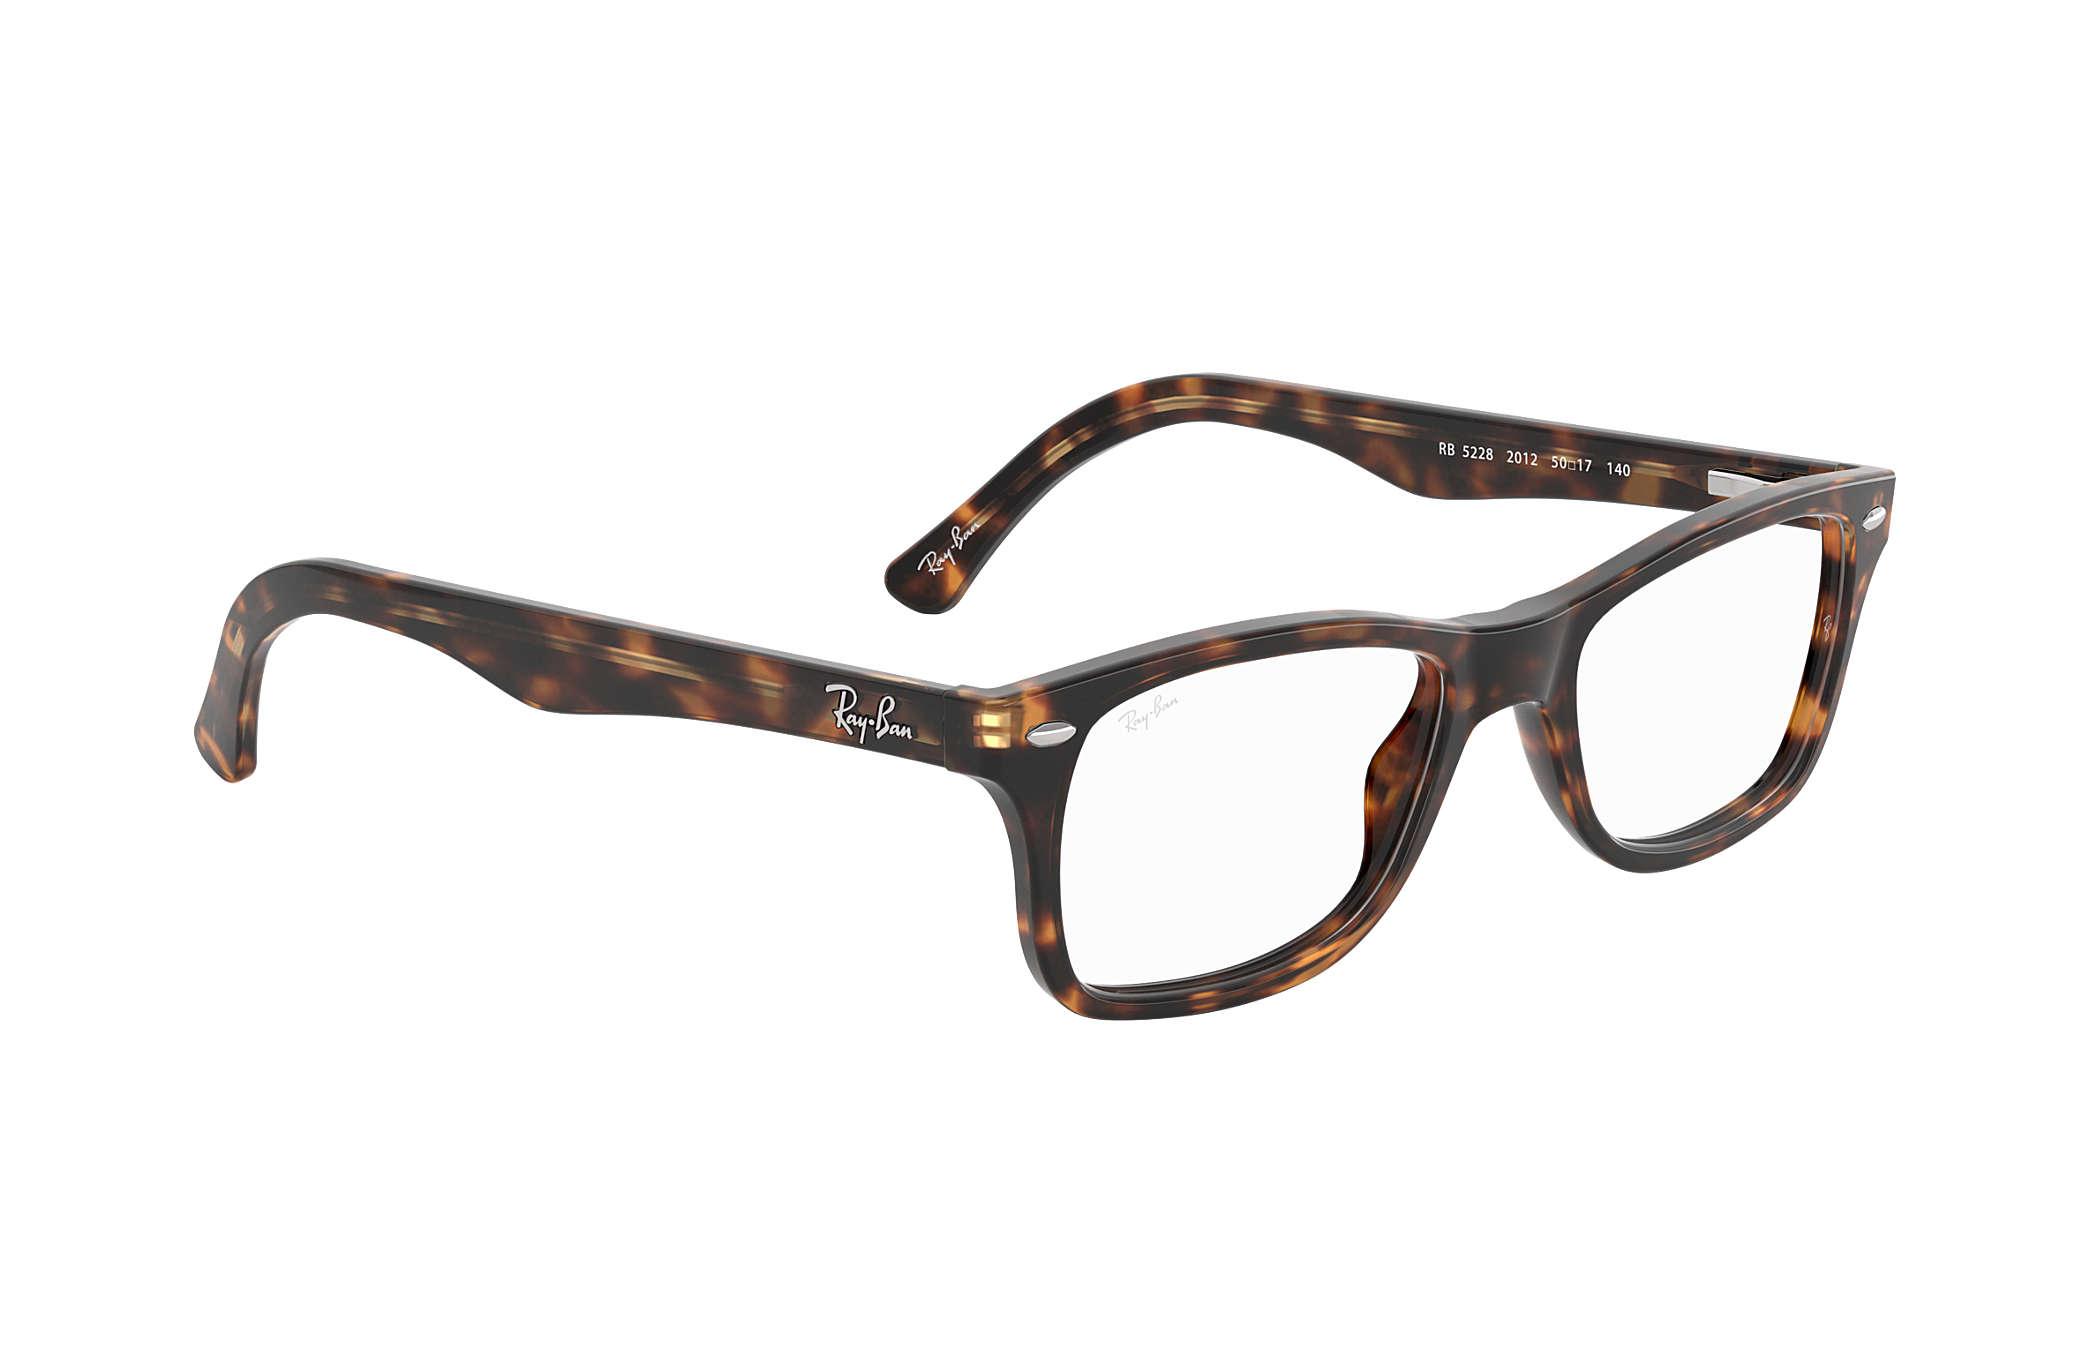 8da6763eeaedc Óculos de grau Ray-Ban RB5228 Tartaruga - Acetato - 0RX5228201253 ...